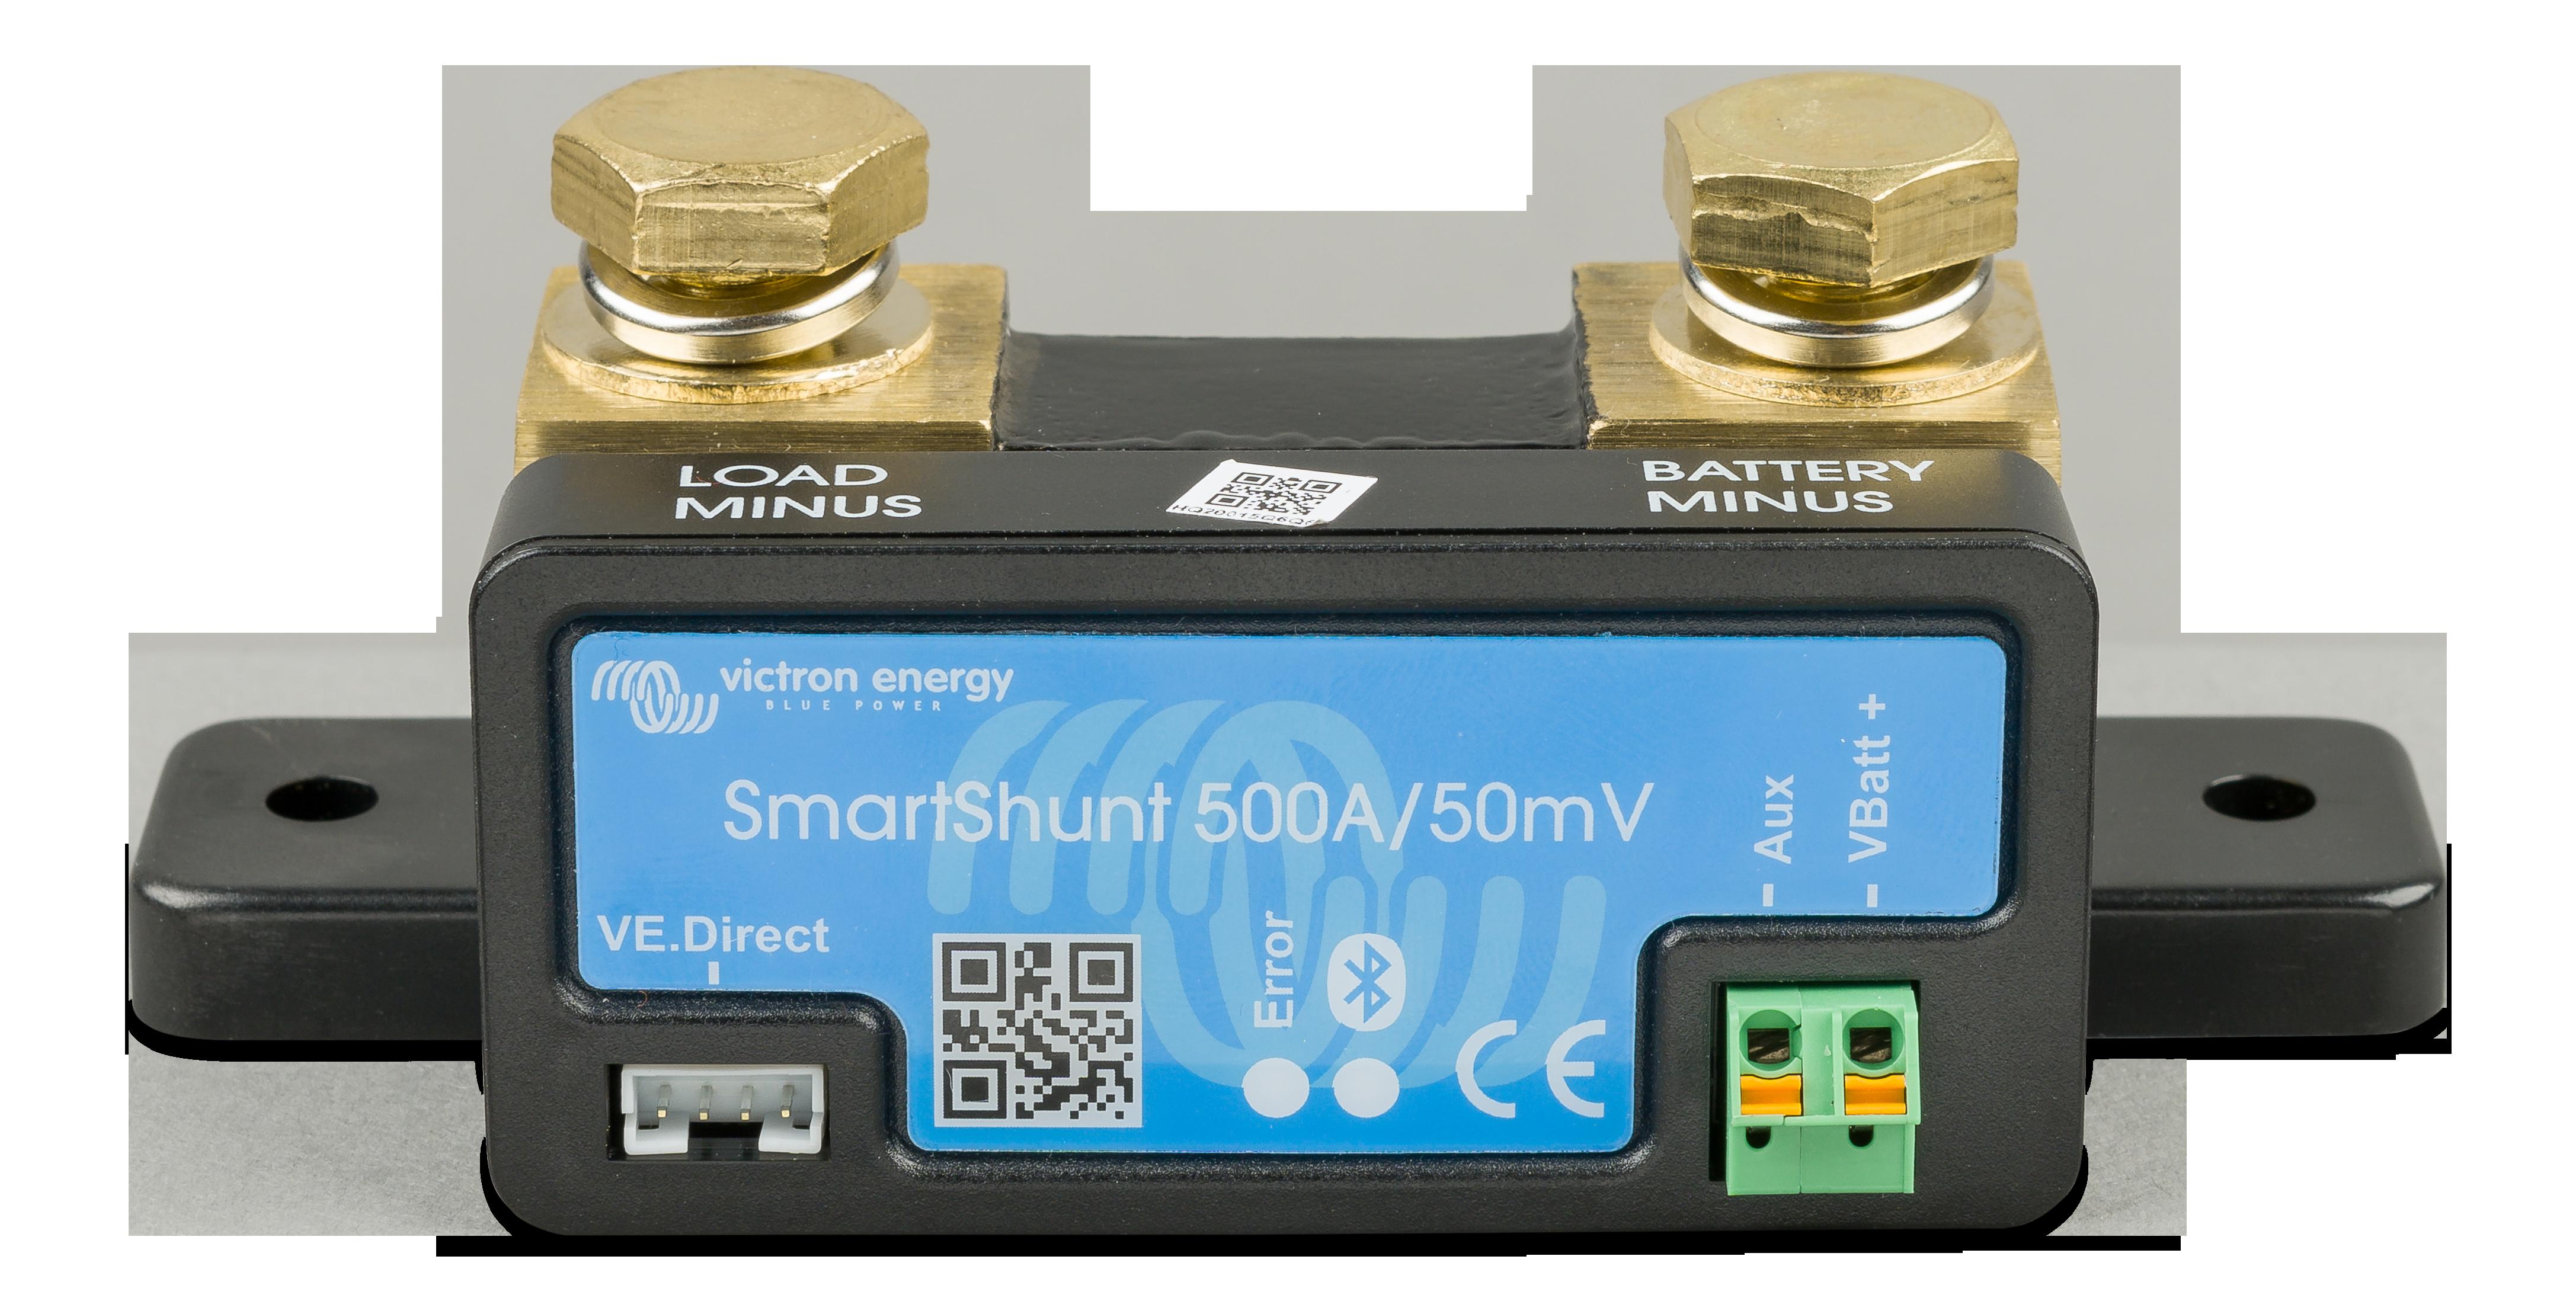 Victron smart shunt 500A